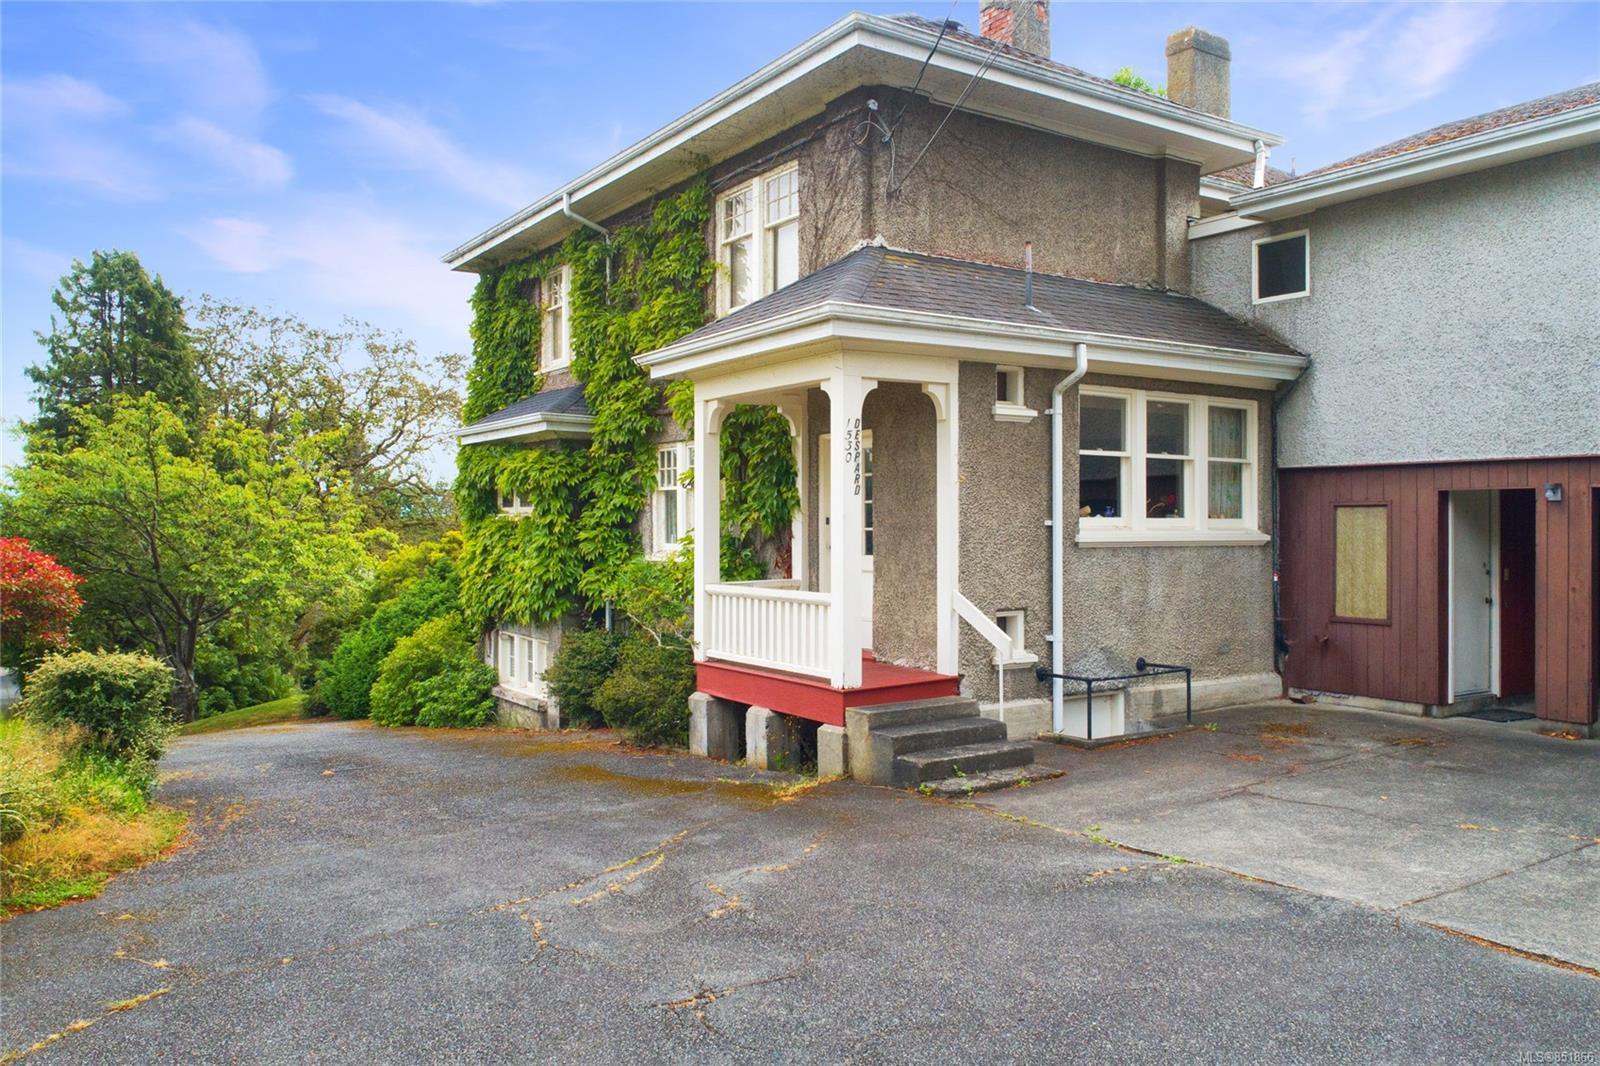 Main Photo: 1530 Despard Ave in : Vi Rockland House for sale (Victoria)  : MLS®# 851866